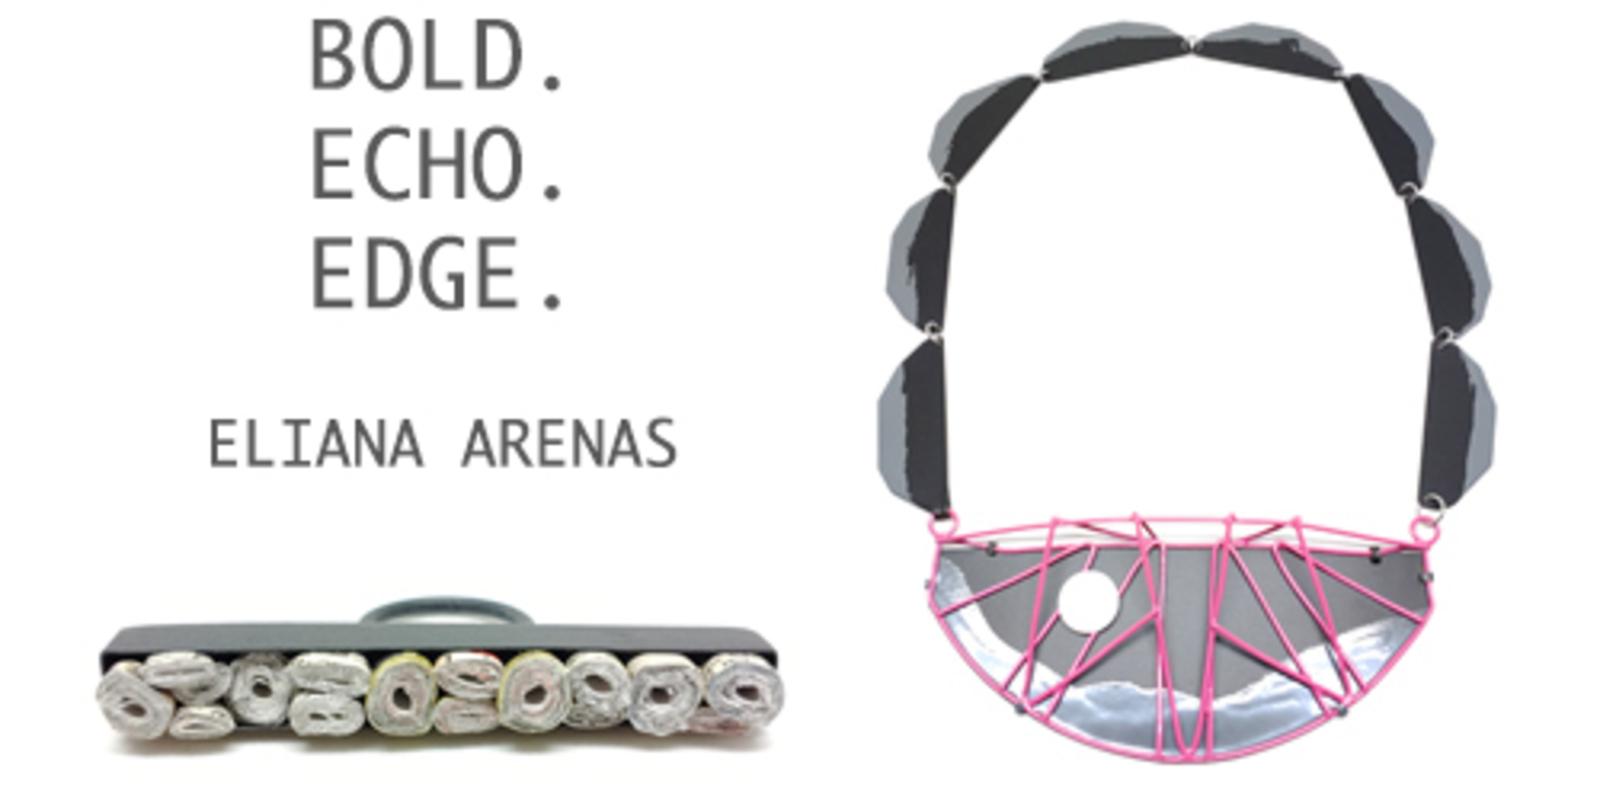 BOLD.ECHO.EDGE - A Solo Exhibition By Eliana Arenas